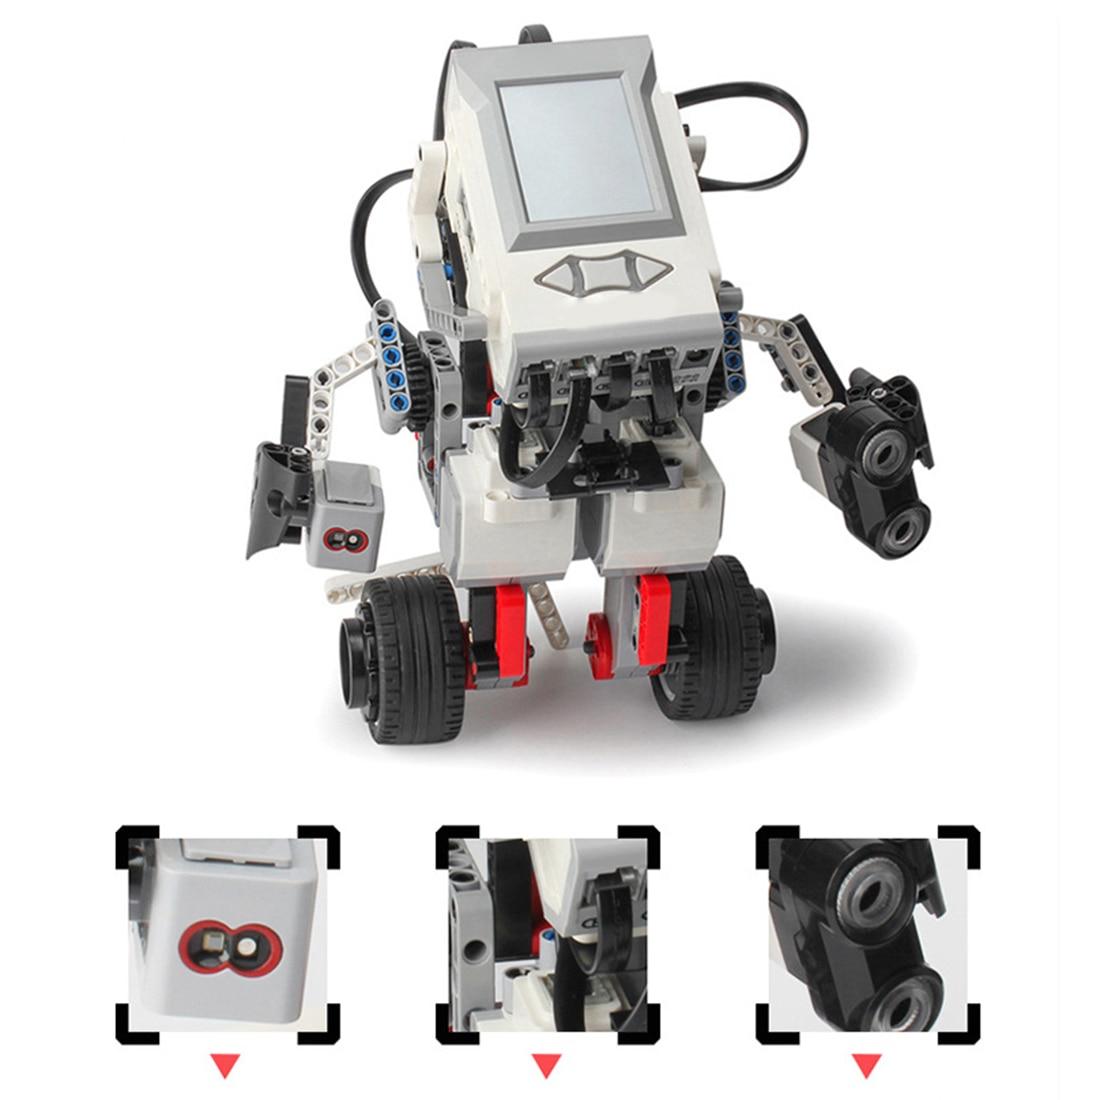 Programmable Model Building Block Assembly Smart Robot Toy Kit DIY Multifunctional Model Educational Learning Kit Children Gift